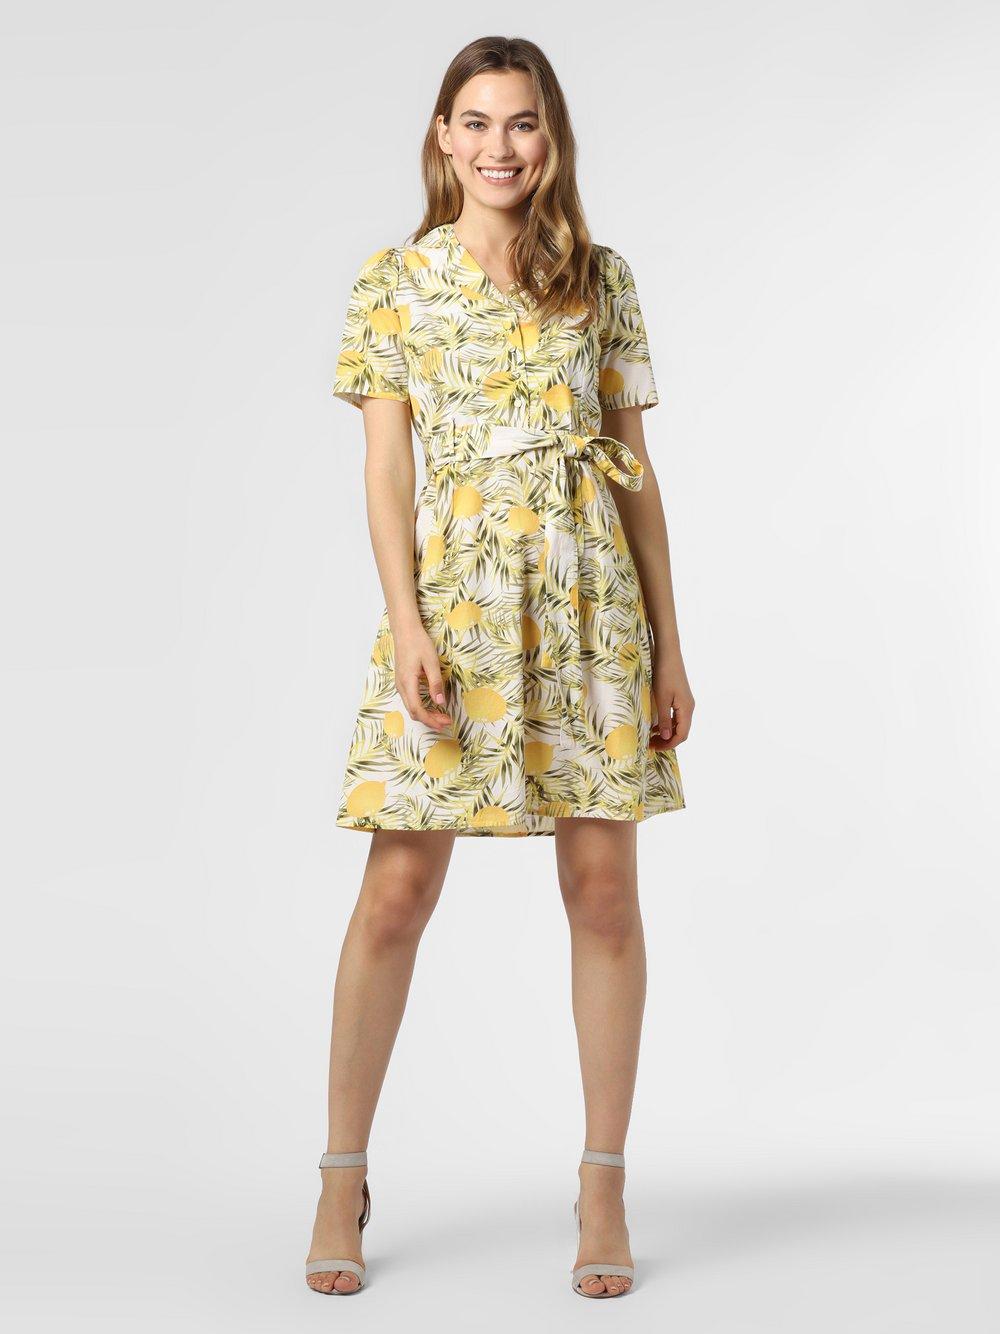 Y.A.S – Sukienka damska – YASLemono, żółty Van Graaf 483146-0001-09940